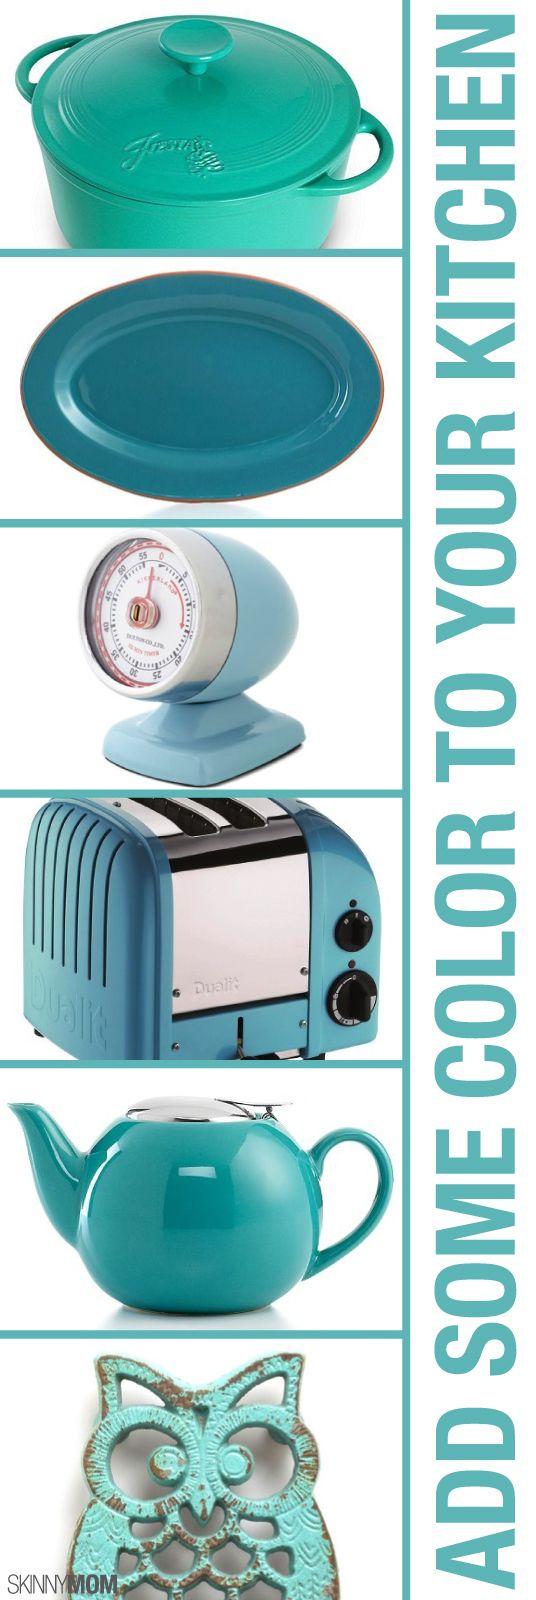 17 Best Ideas About Turquoise Kitchen Decor On Pinterest